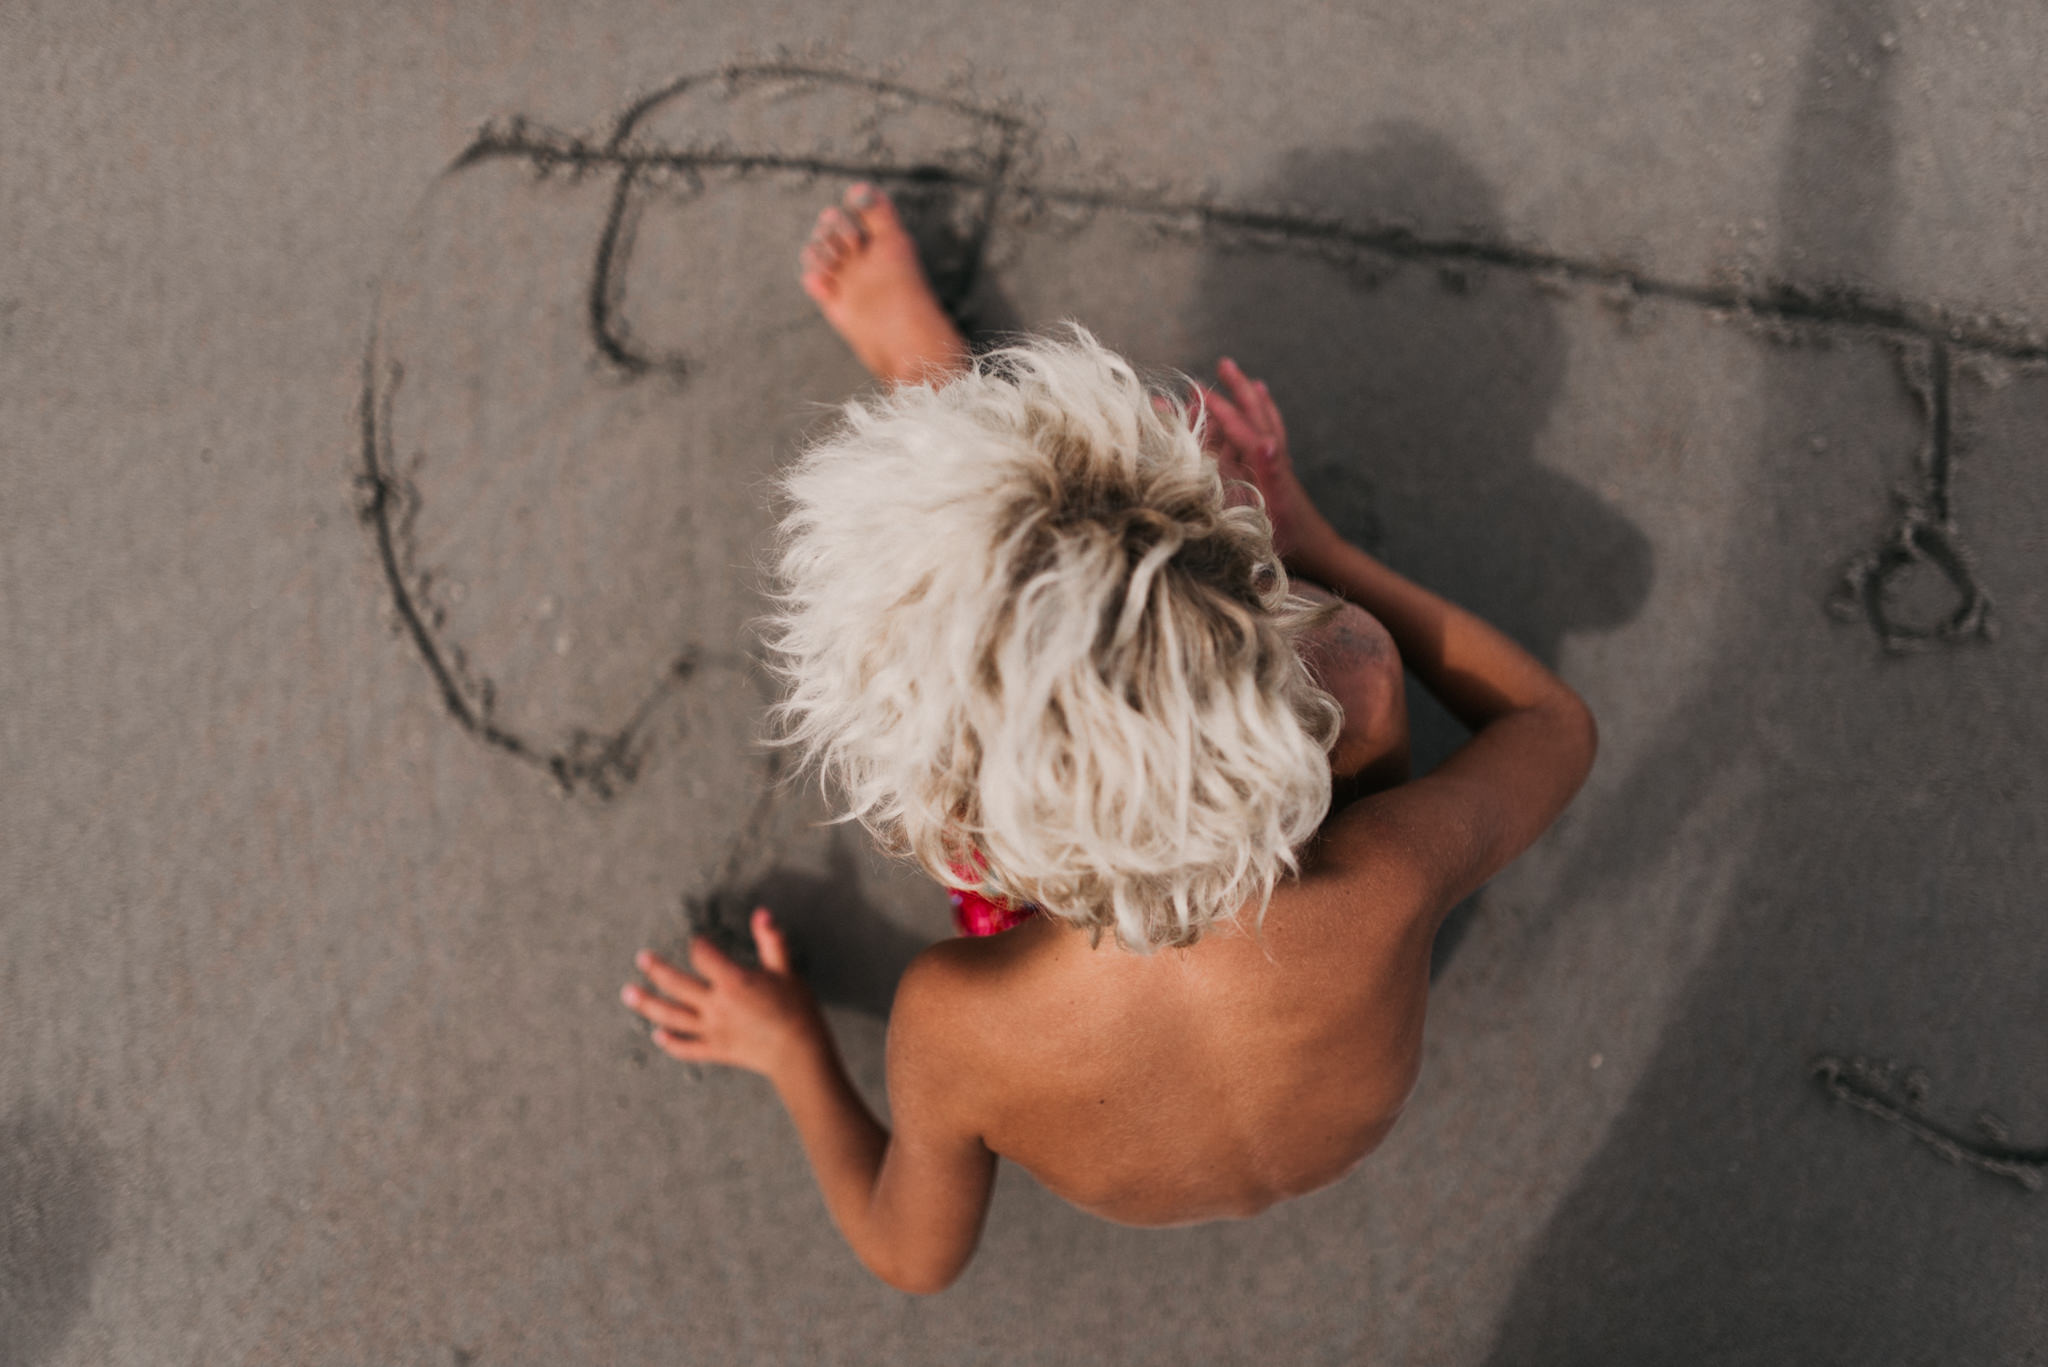 twyla jones photography - treasure coast florida - stormy beach boy playing in sand--14.jpg